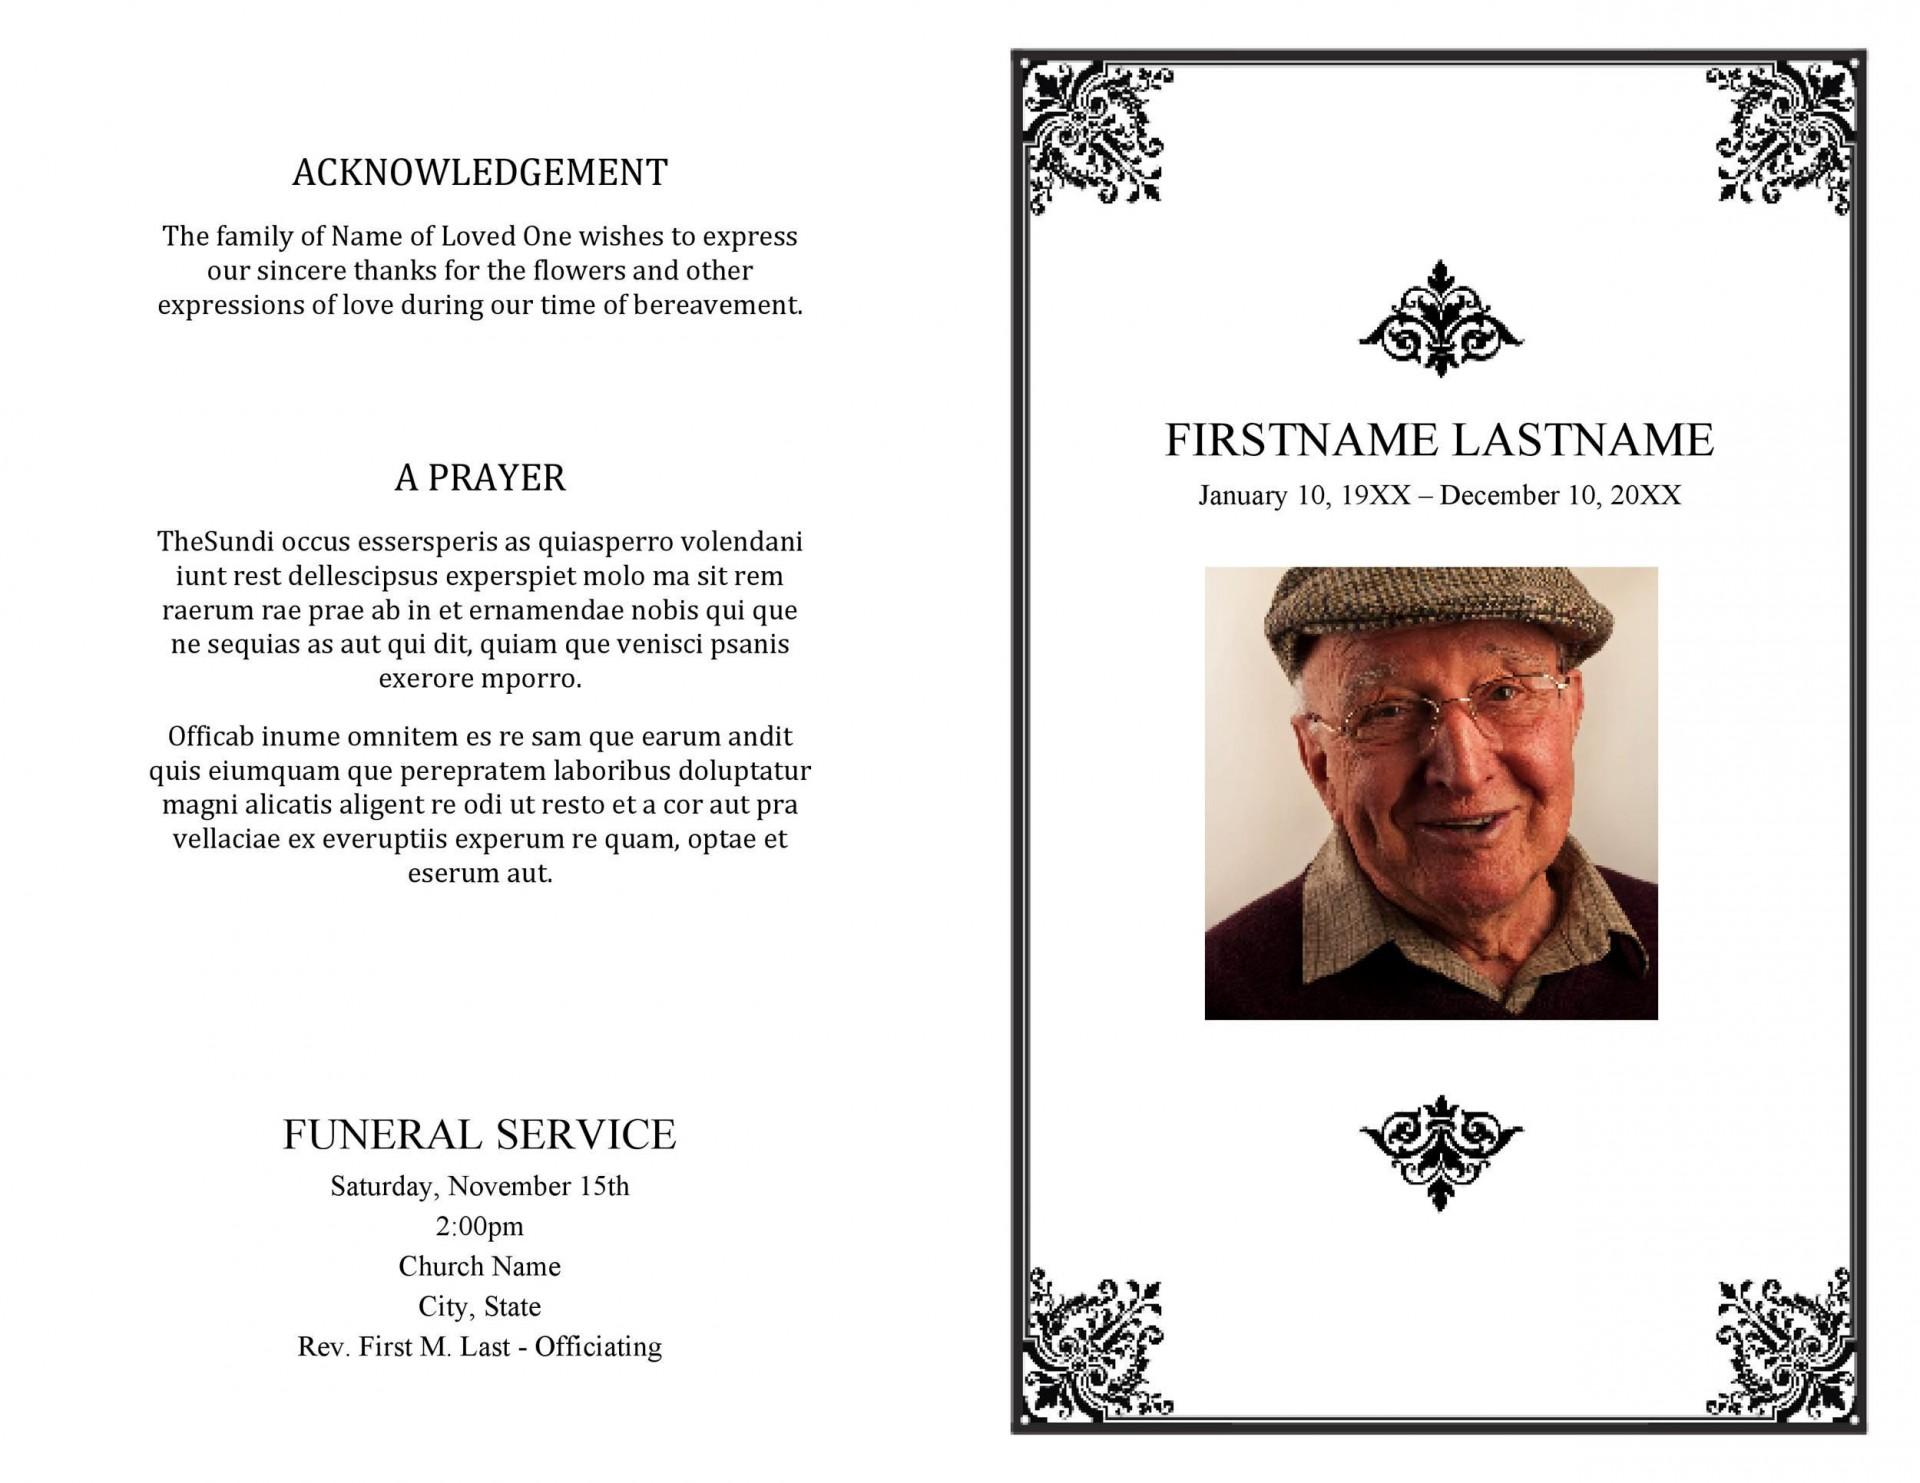 006 Striking Template For Funeral Program Free Image  Printable Download On Word Editable Pdf1920